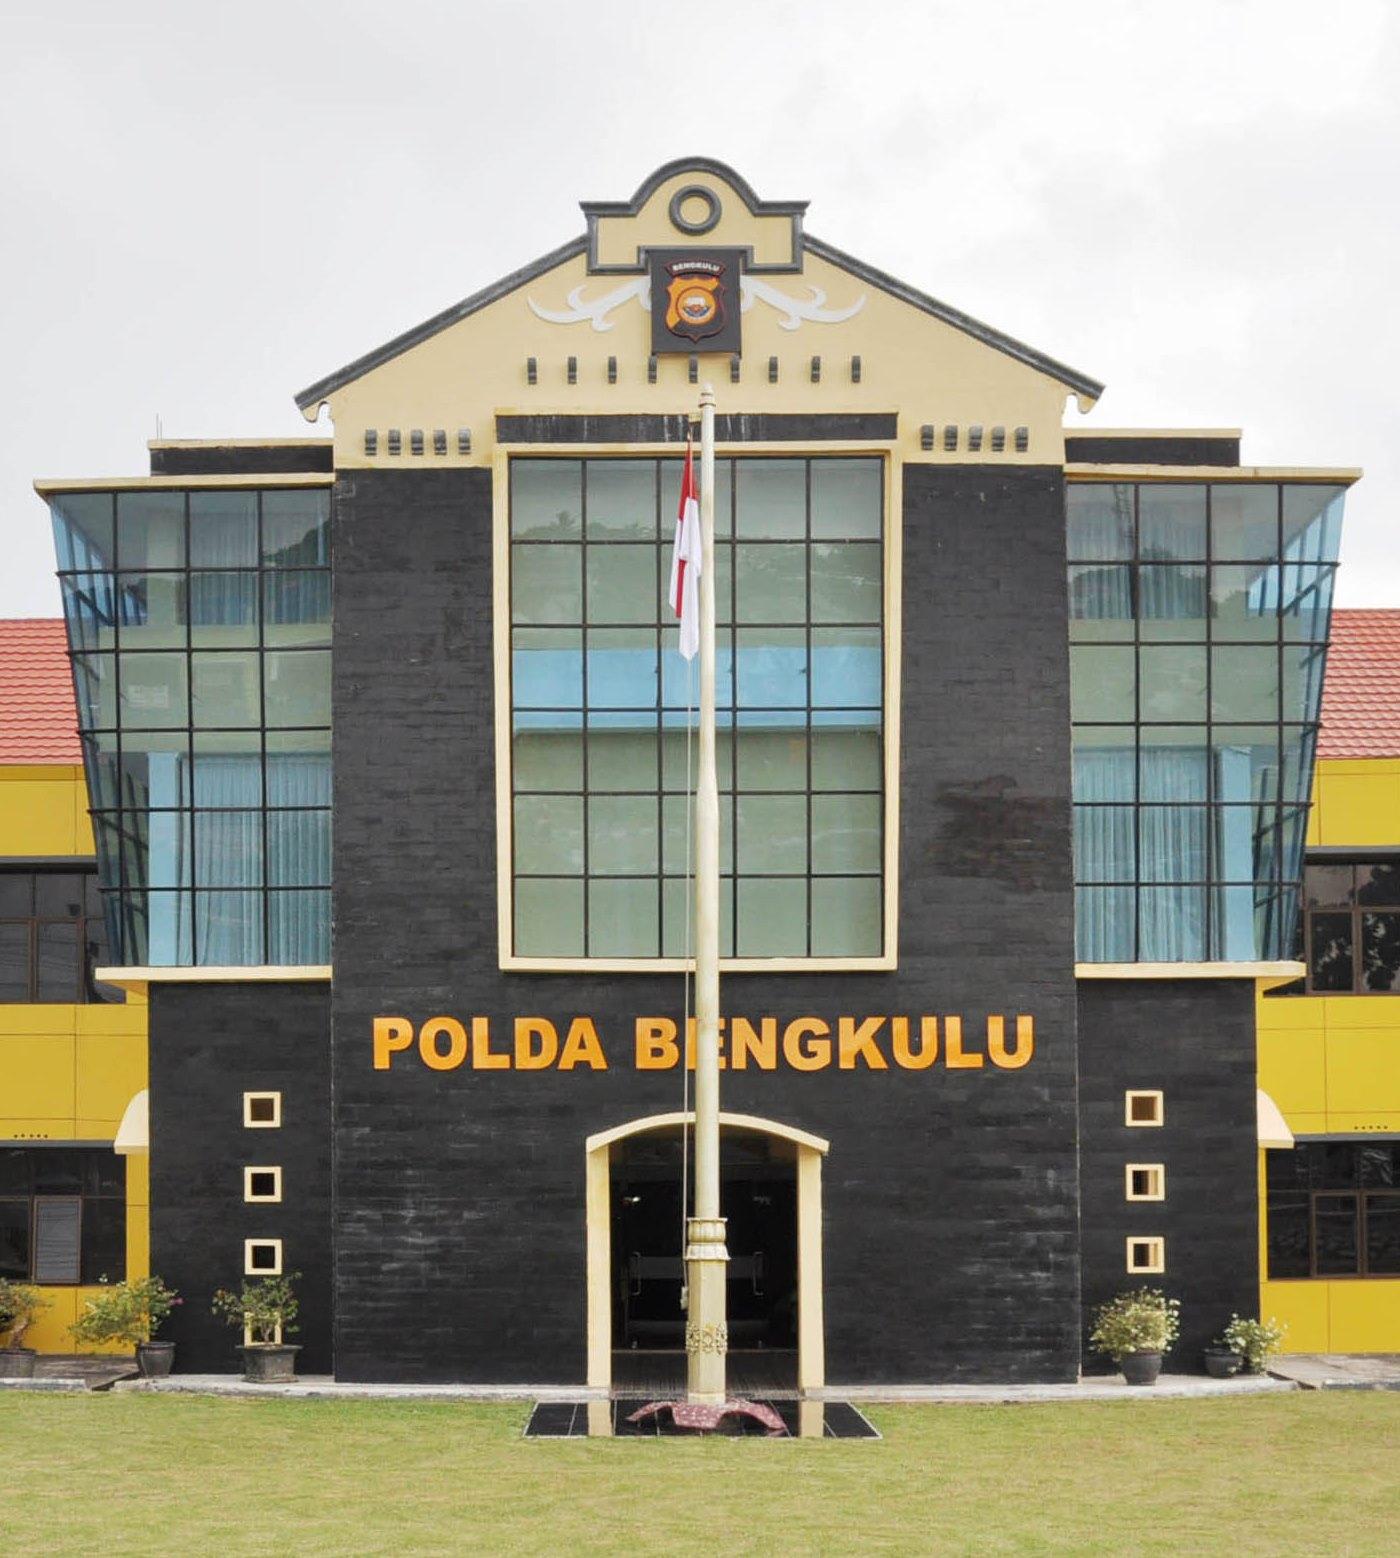 Operasi Wanalaga Nala 2018, Polda Bengkulu dan Jajaran Ungkap 20 Kasus